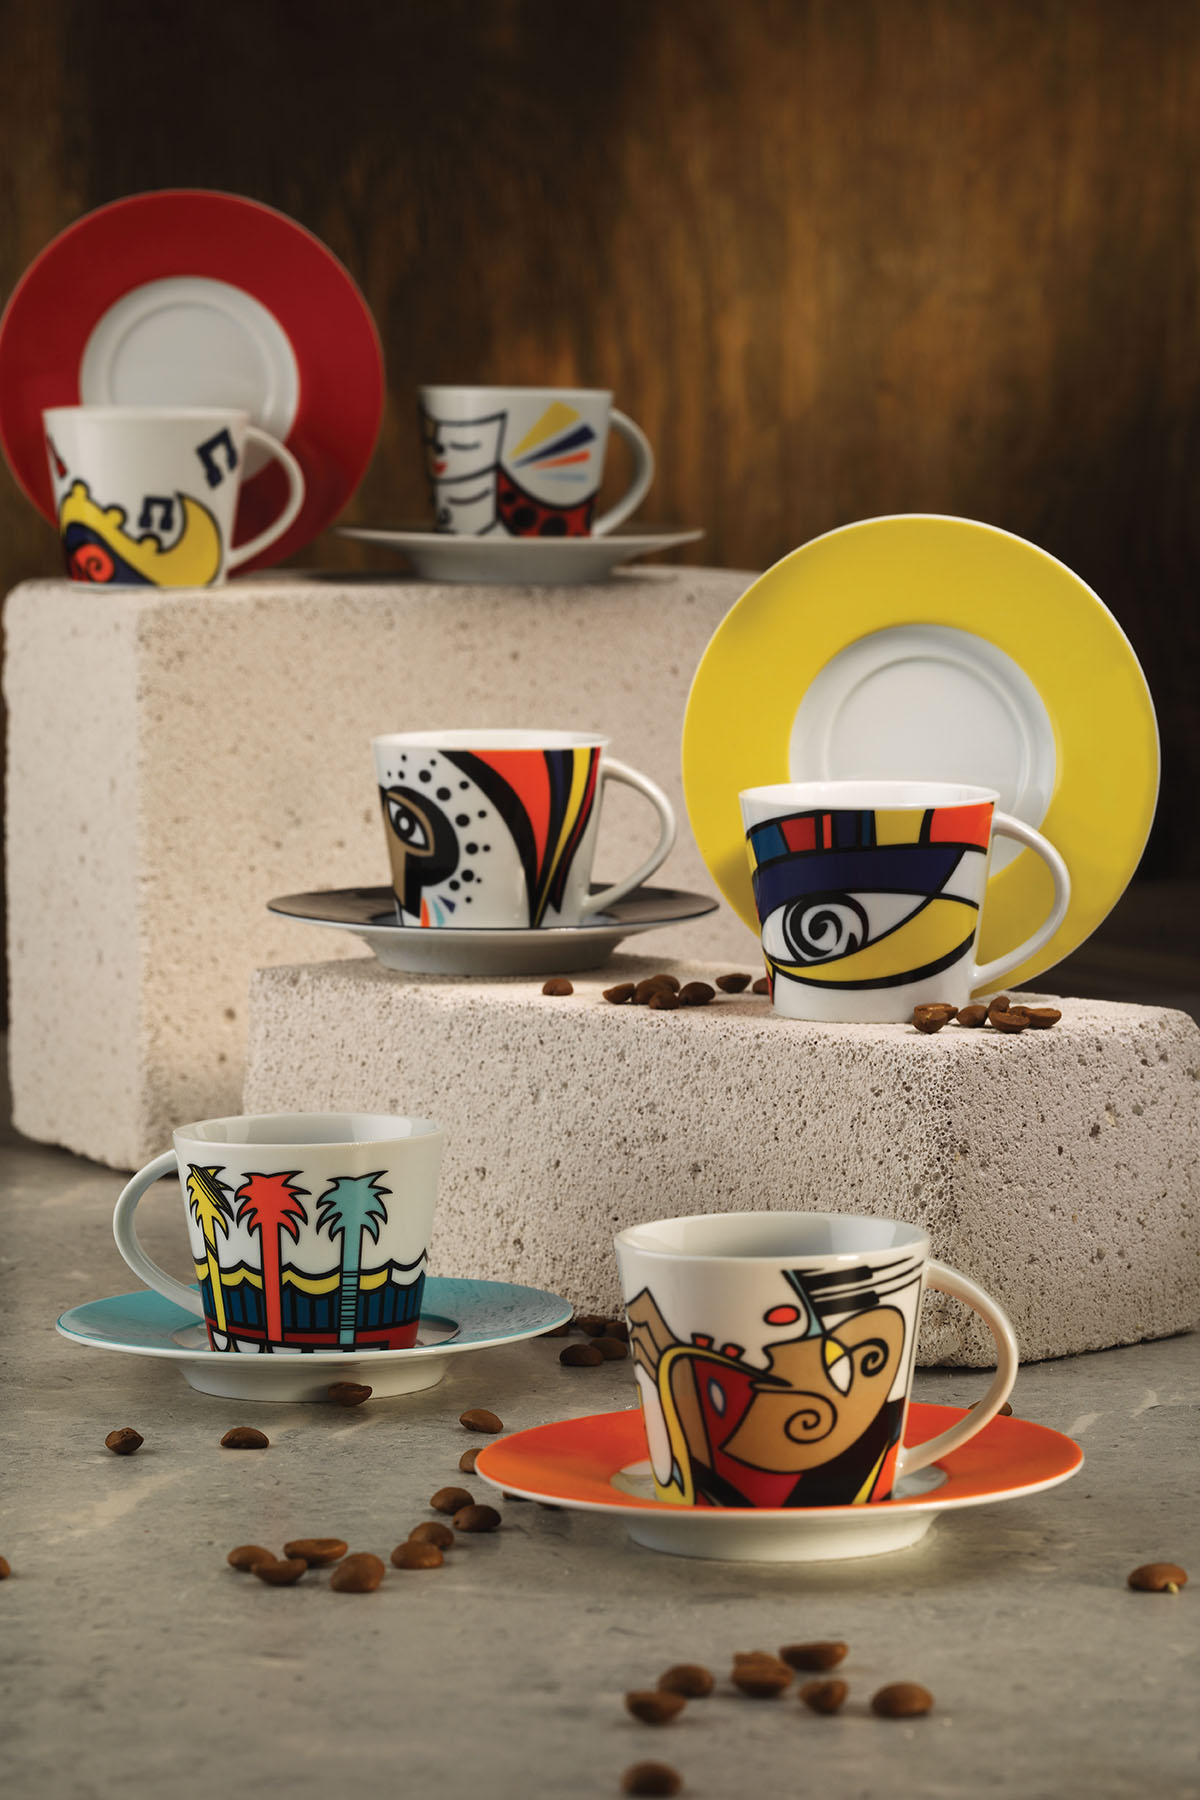 Kütahya Porselen - Kütahya Porselen Free Time Çay Takımı